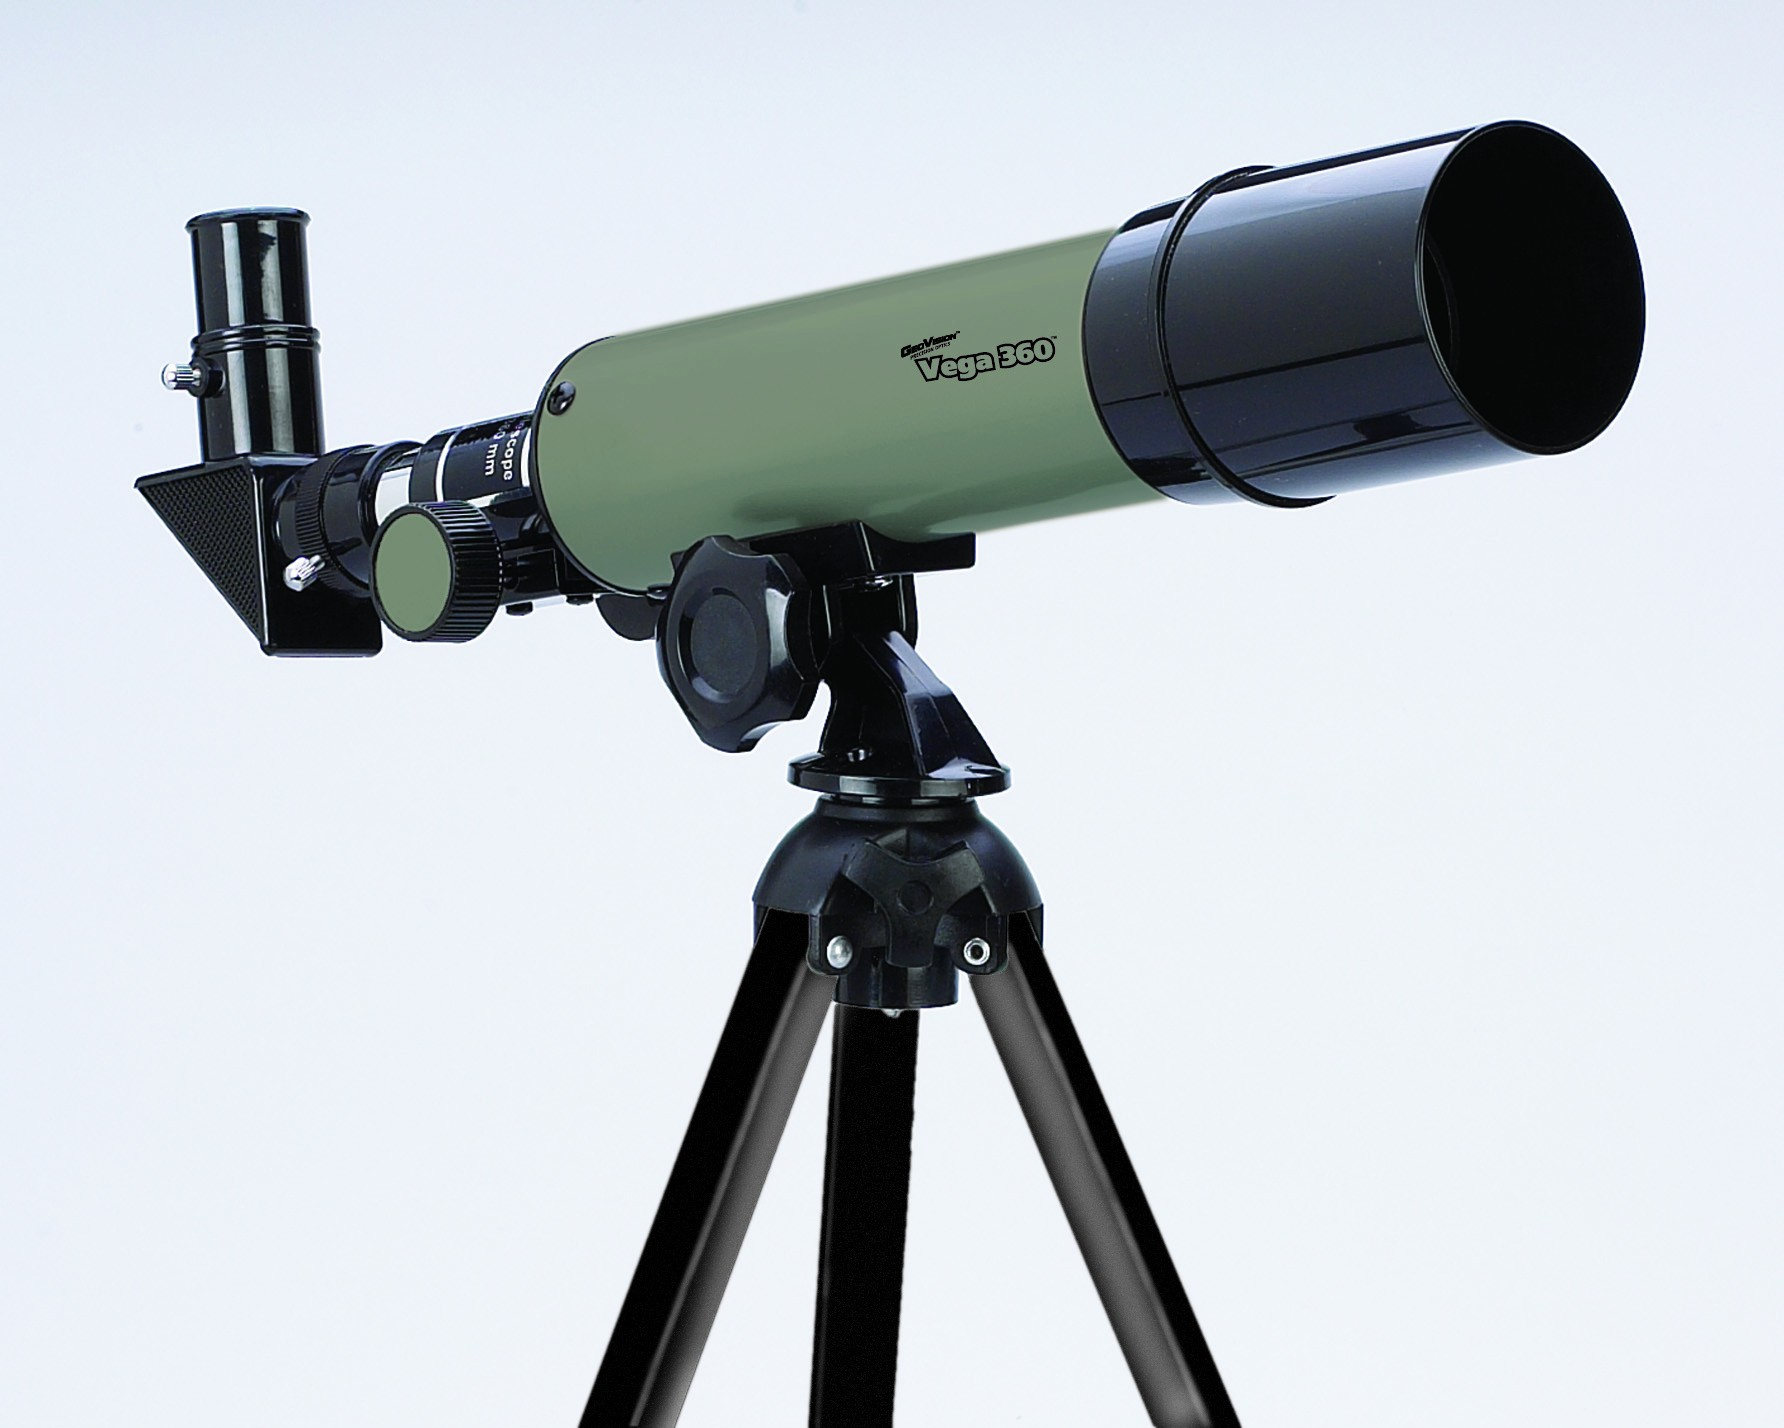 Teleskop Vega 360